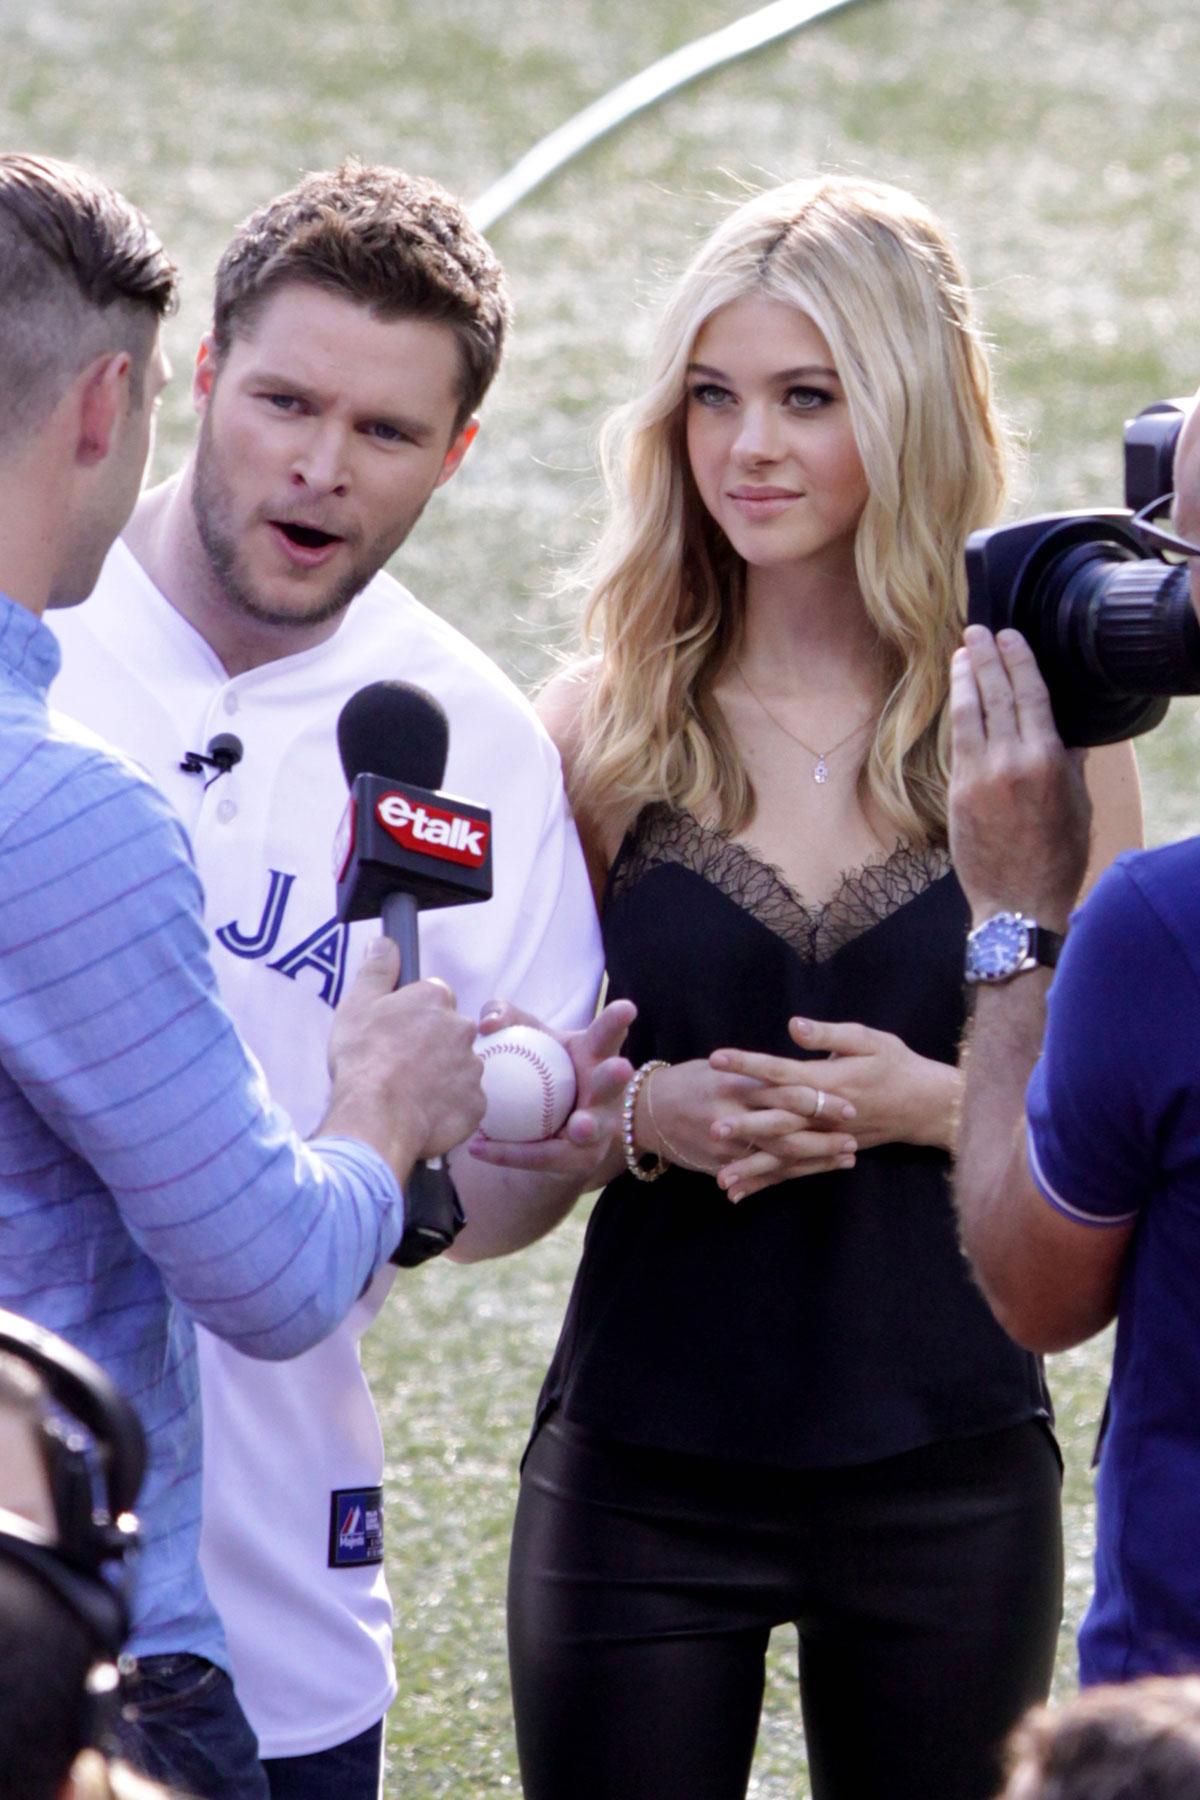 Nicola Peltz attends Blue Jays baseball game